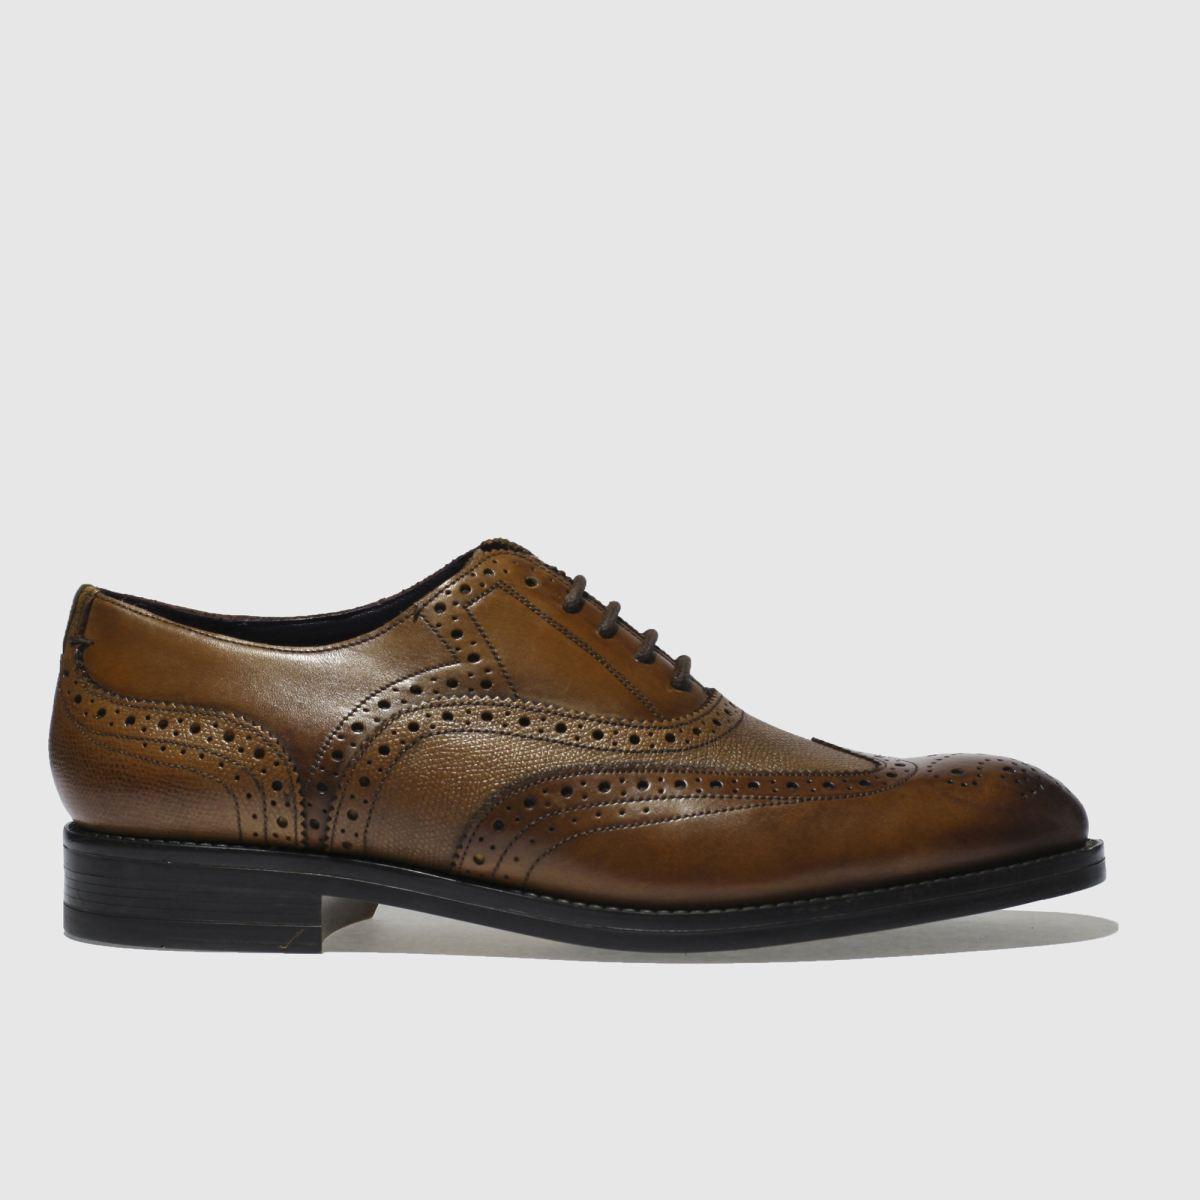 Ted Baker Tan Almhano Shoes